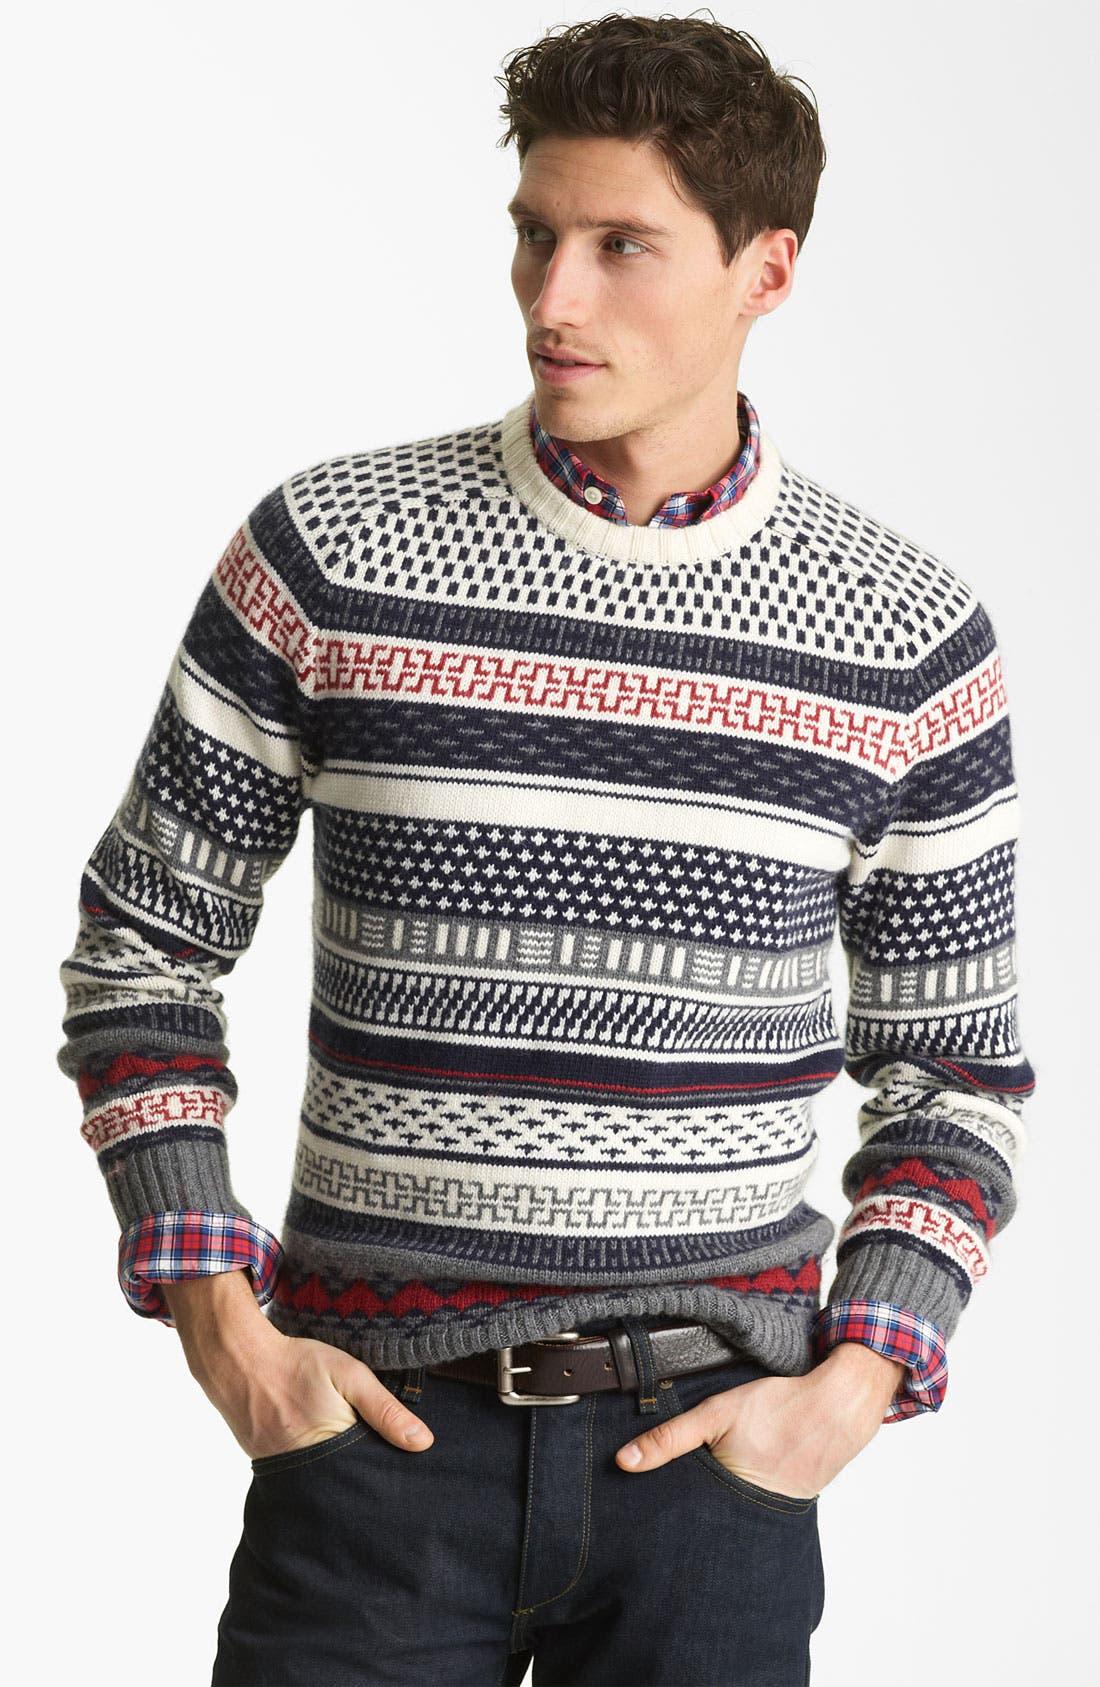 JACK SPADE 'Stone' Fair Isle Crewneck Sweater, Main, color, 142